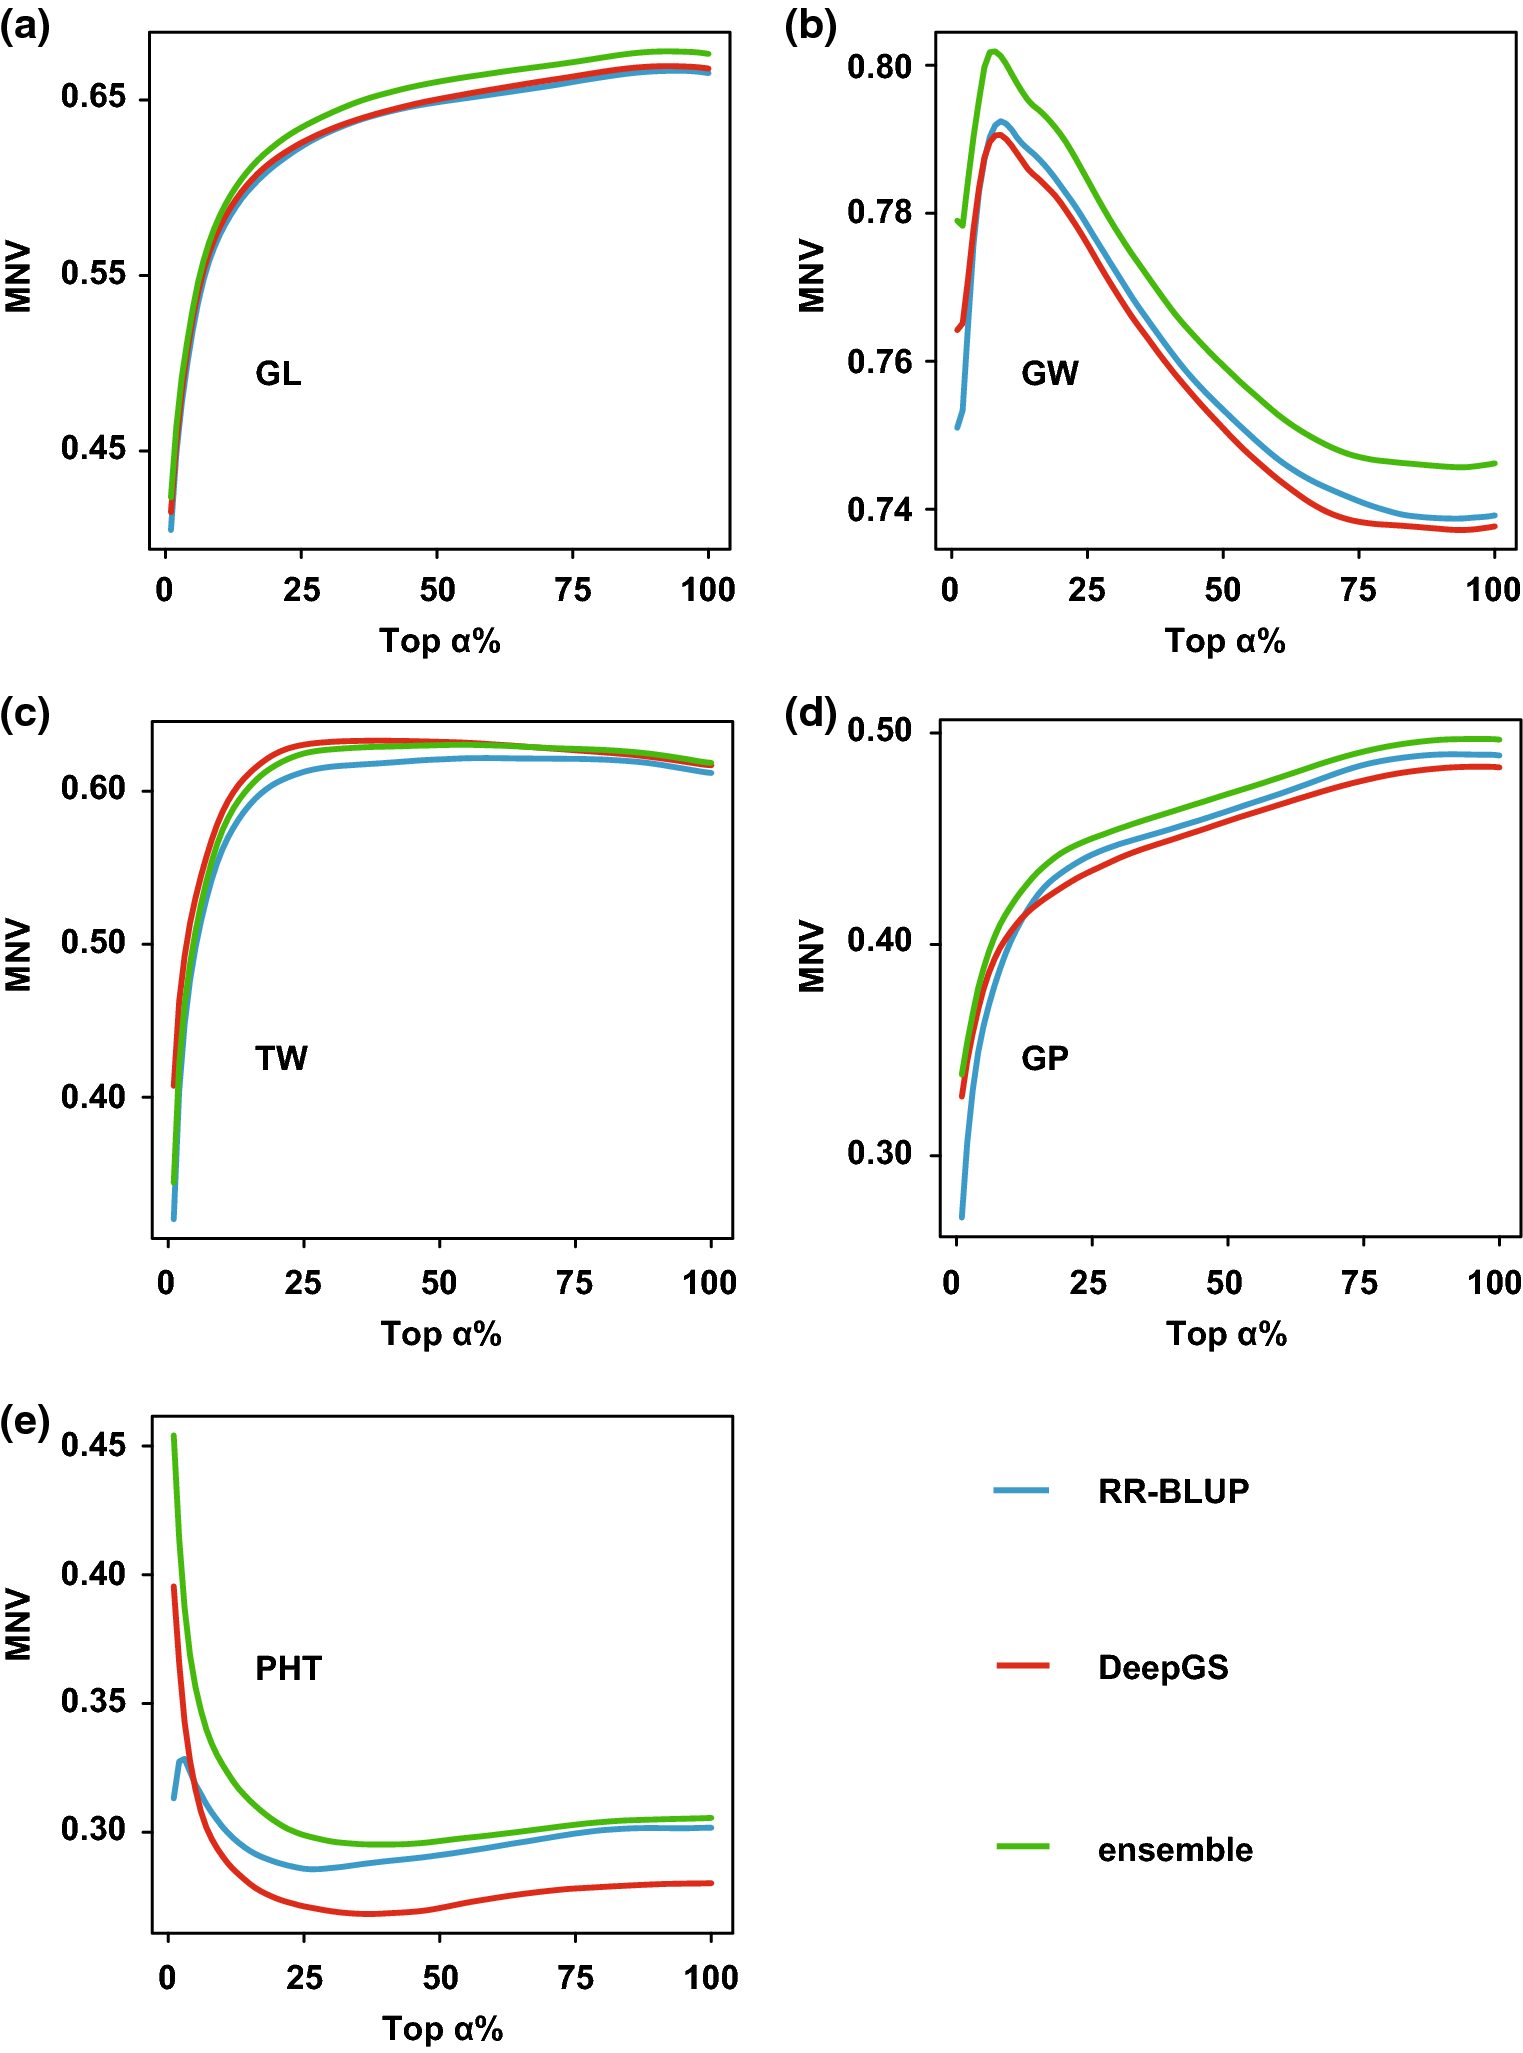 A deep convolutional neural network approach for predicting